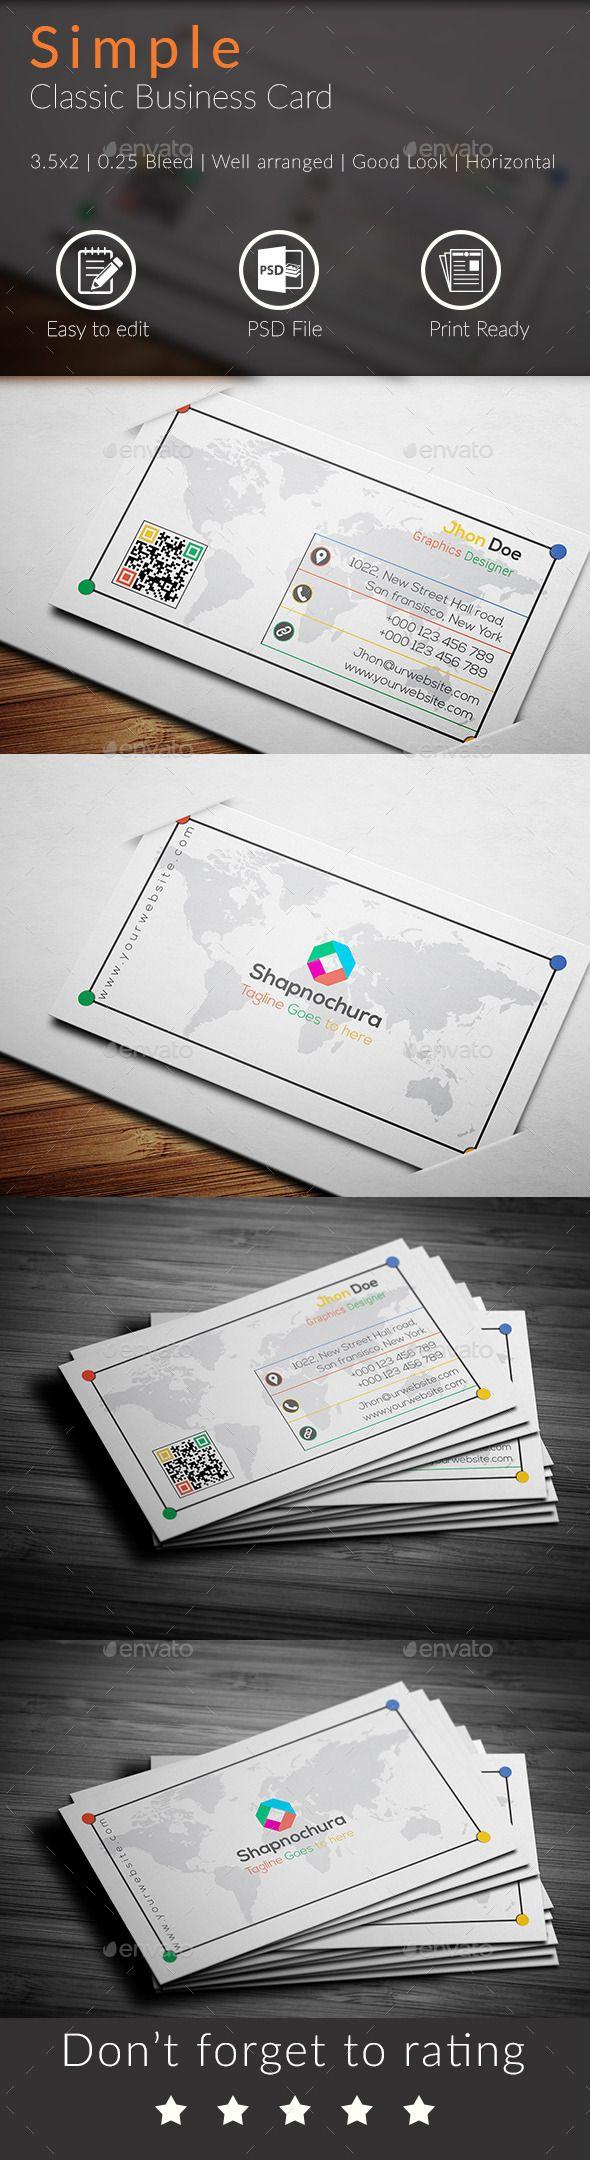 512 best Business Card images on Pinterest   Business card design ...